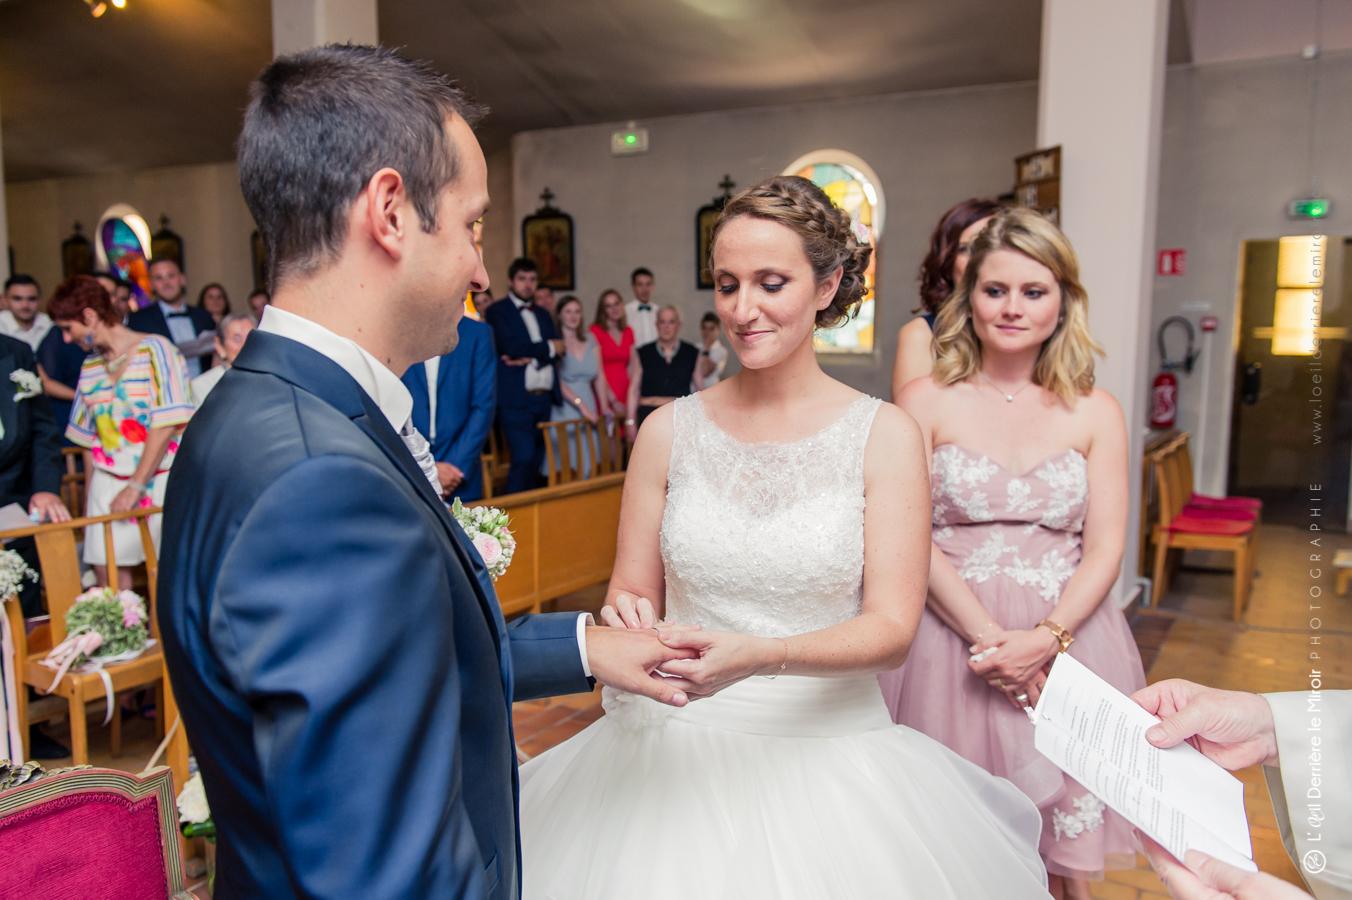 mariage-cj-vaugrenier-loeilderrierelemiroir-040